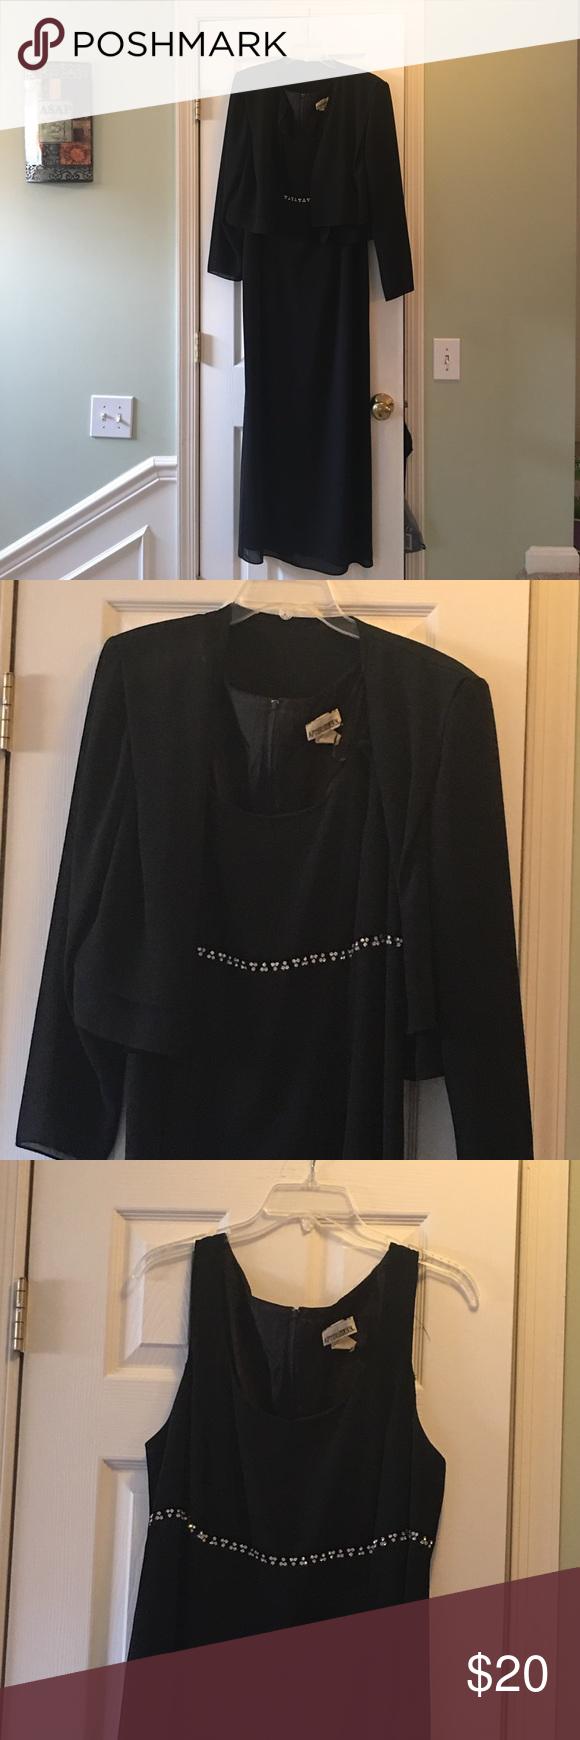 Long black dress beautiful sleeveless black dress with rhinestones